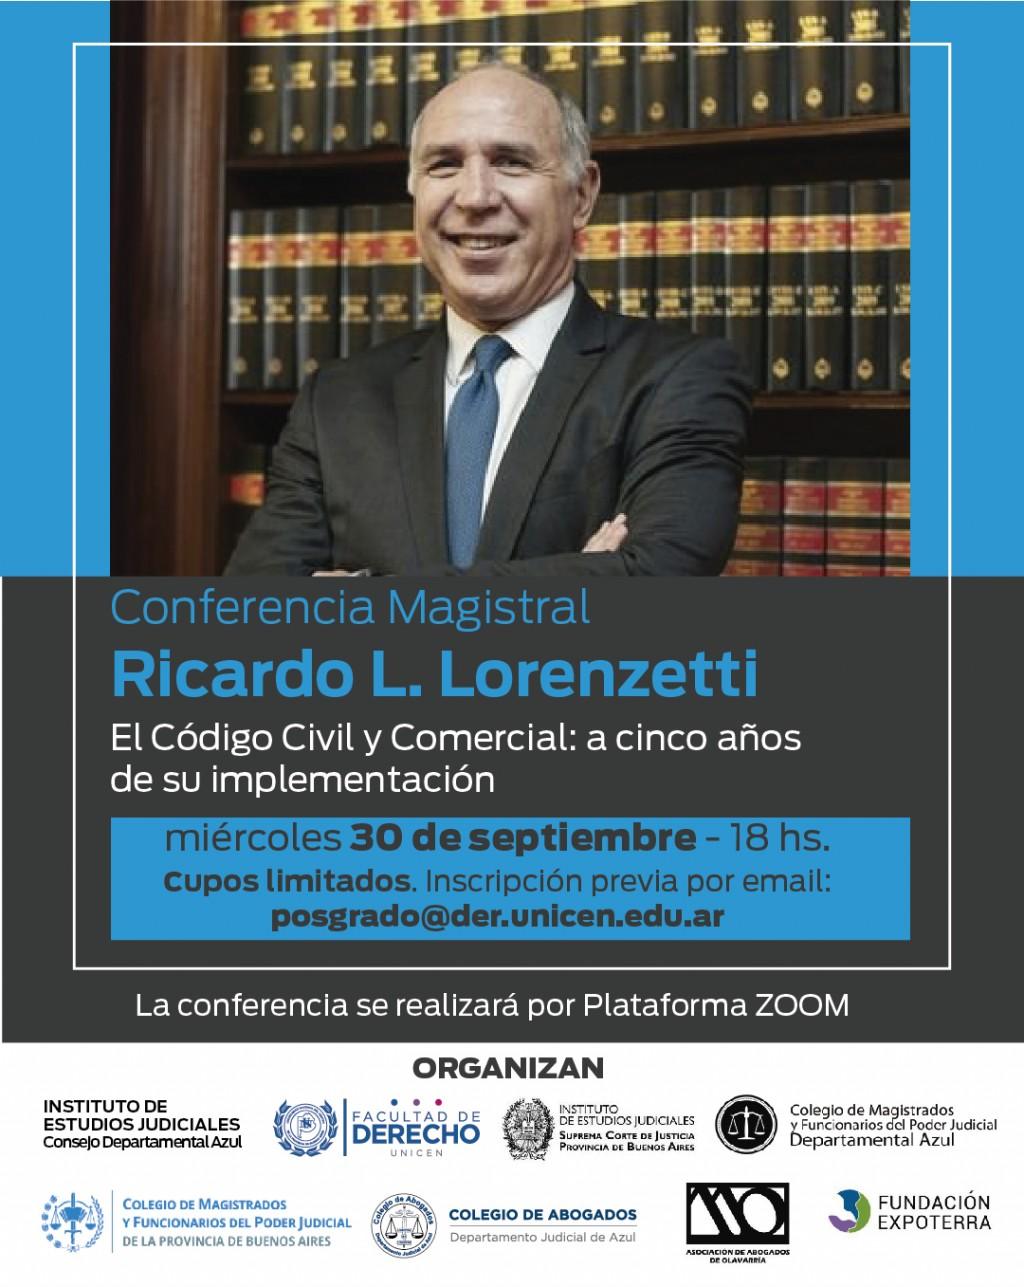 Derecho de Azul convoca a una Conferencia Magistral del Prof. Dr. Ricardo Lorenzetti